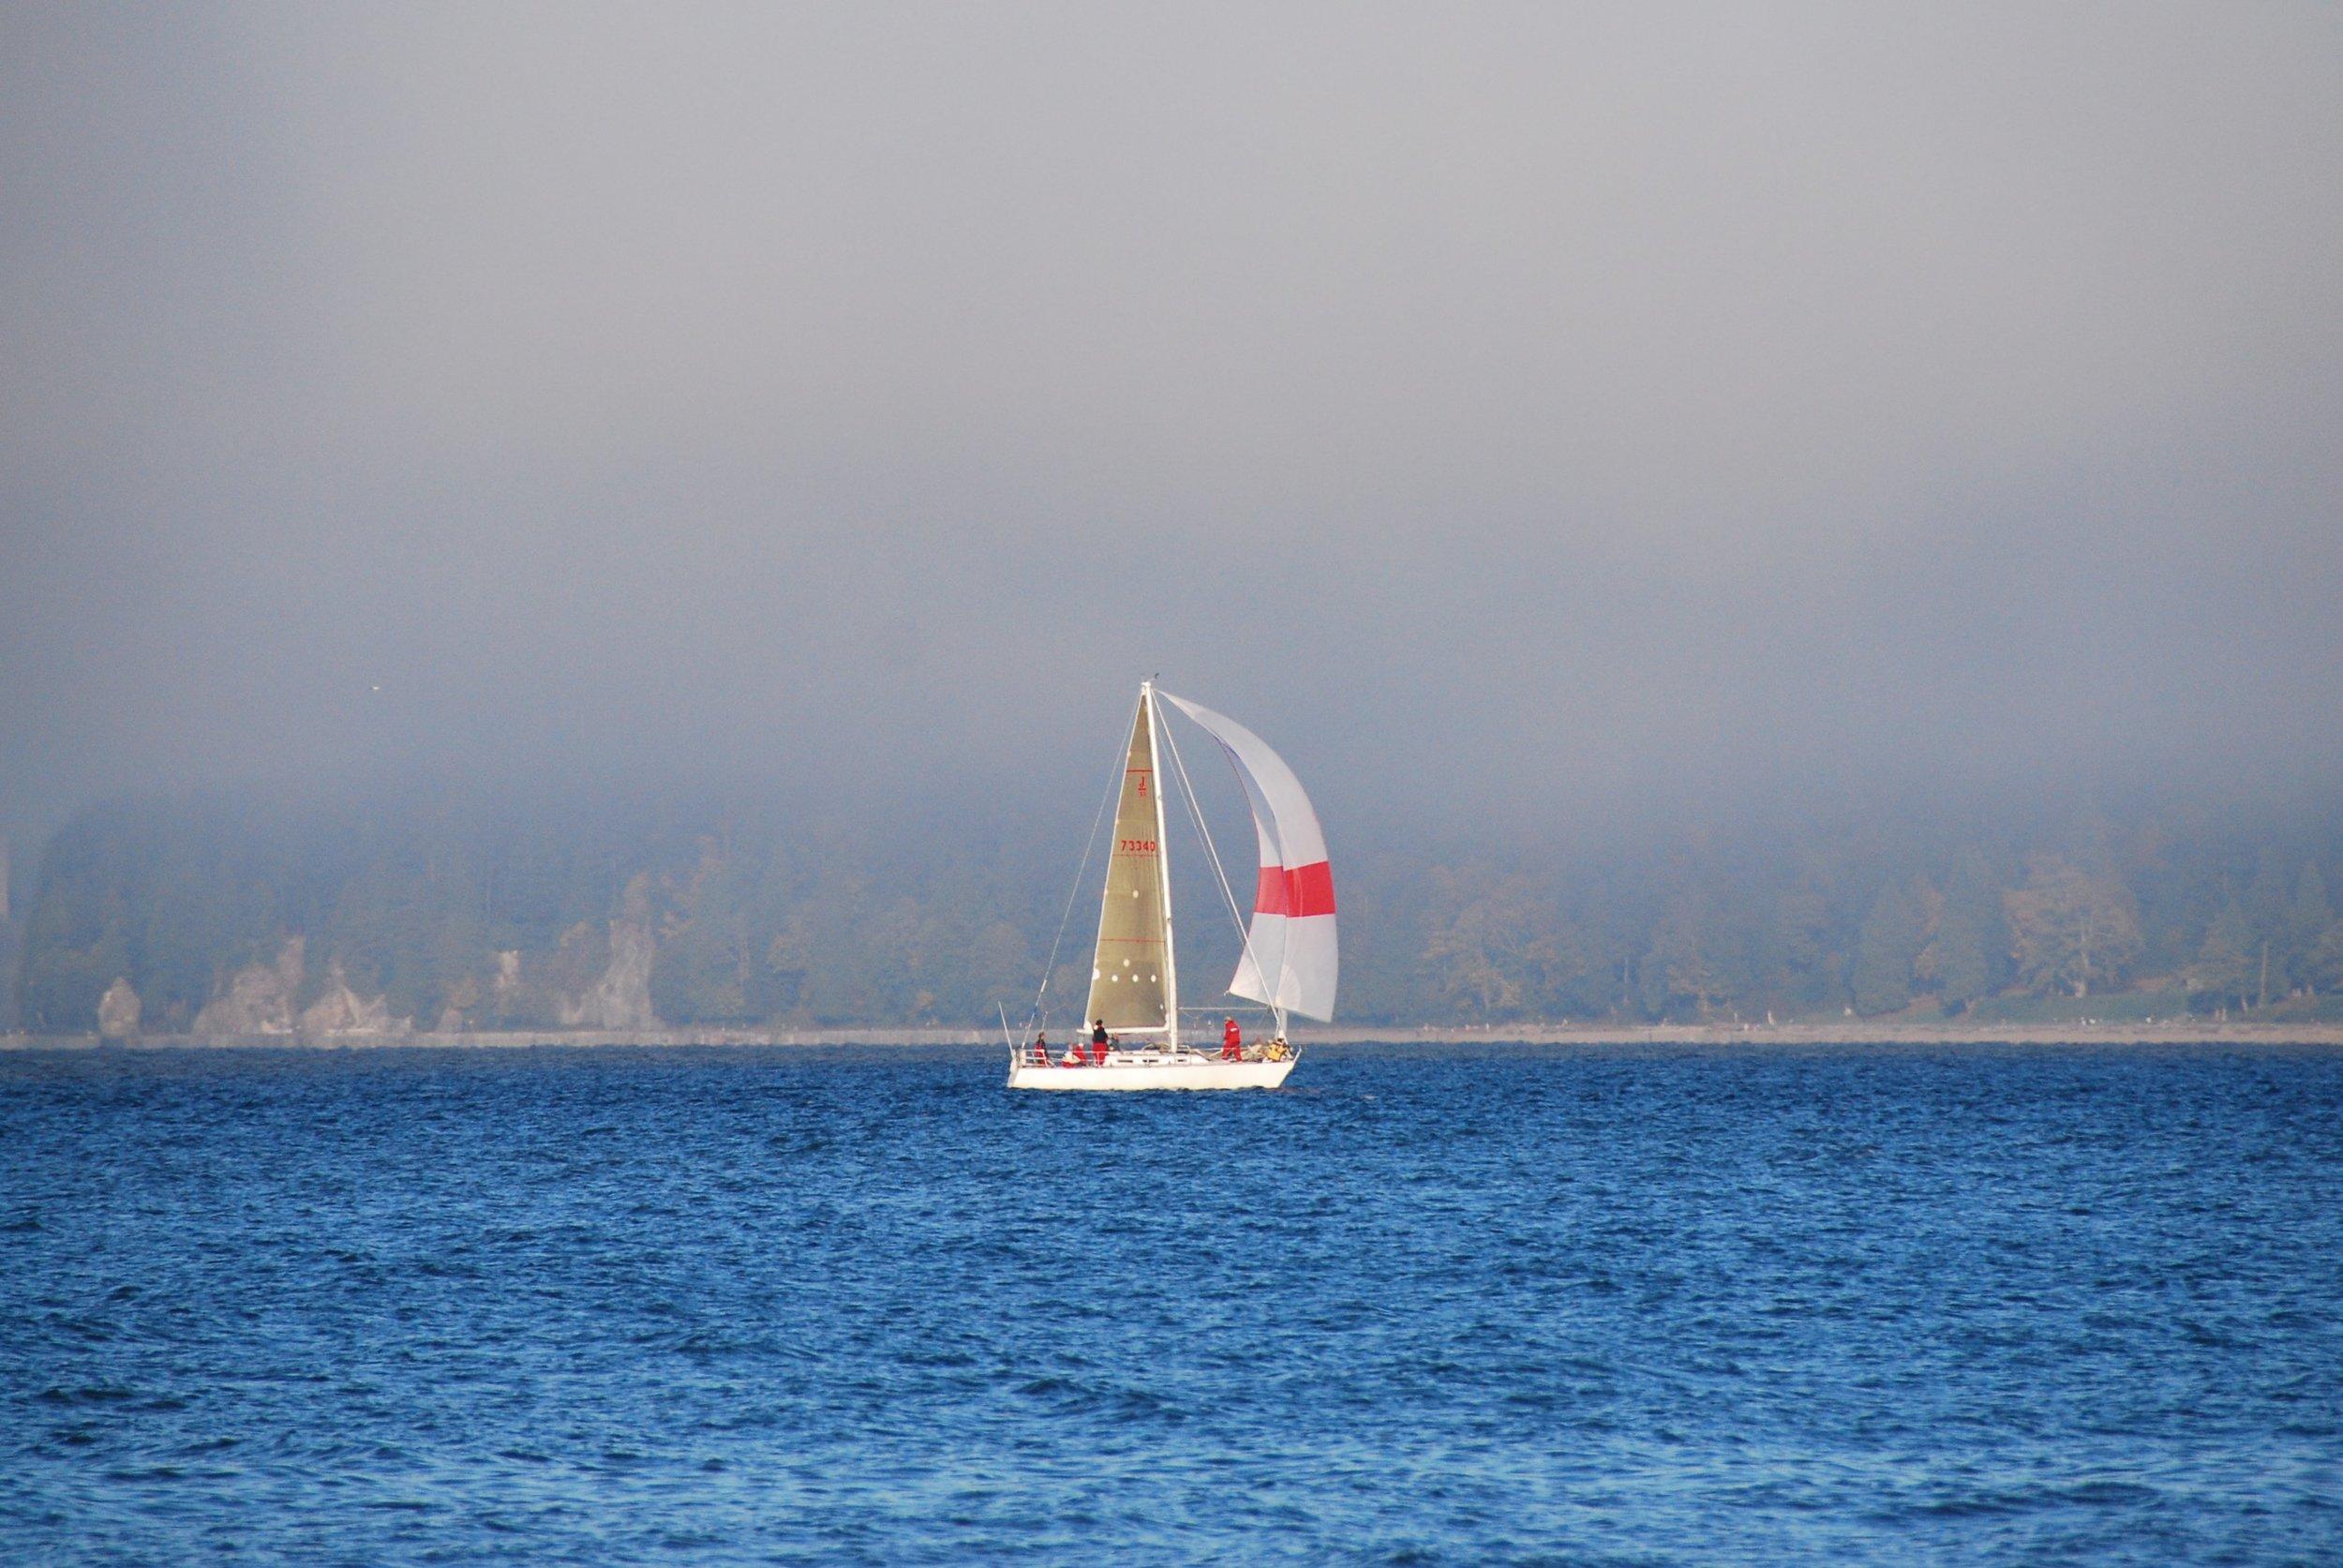 10.3 Sailboat – Thomas Milne, Flickr